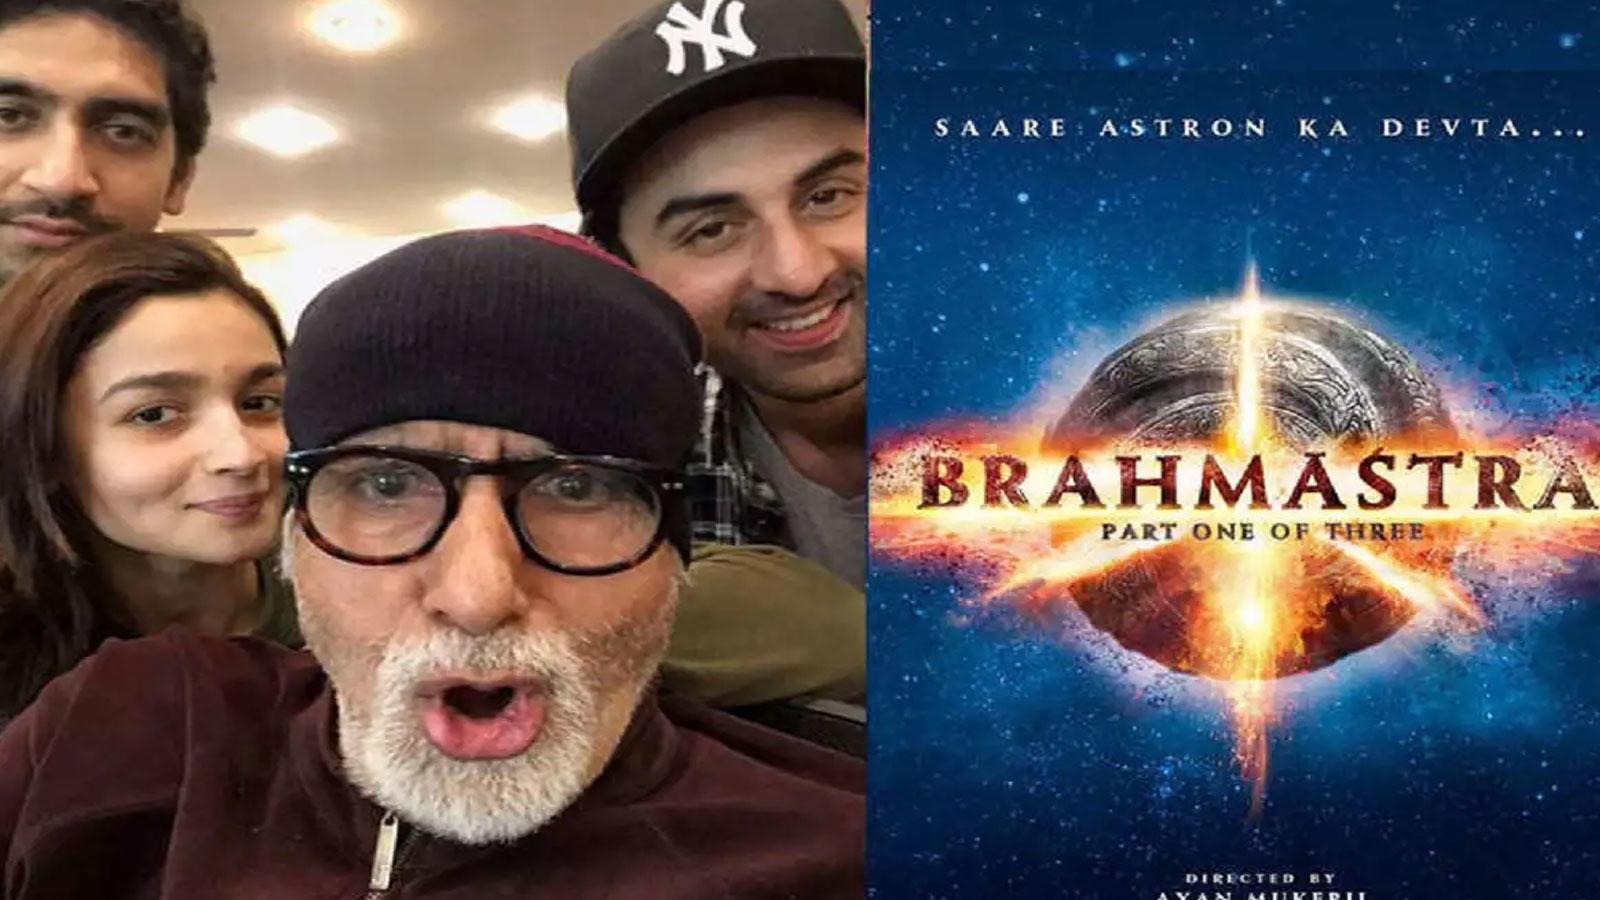 Brahmastra: Alia Bhatt and Ranbir Kapoor's fantasy film to be released in 2022? | Hindi Movie News – Bollywood – Times of India